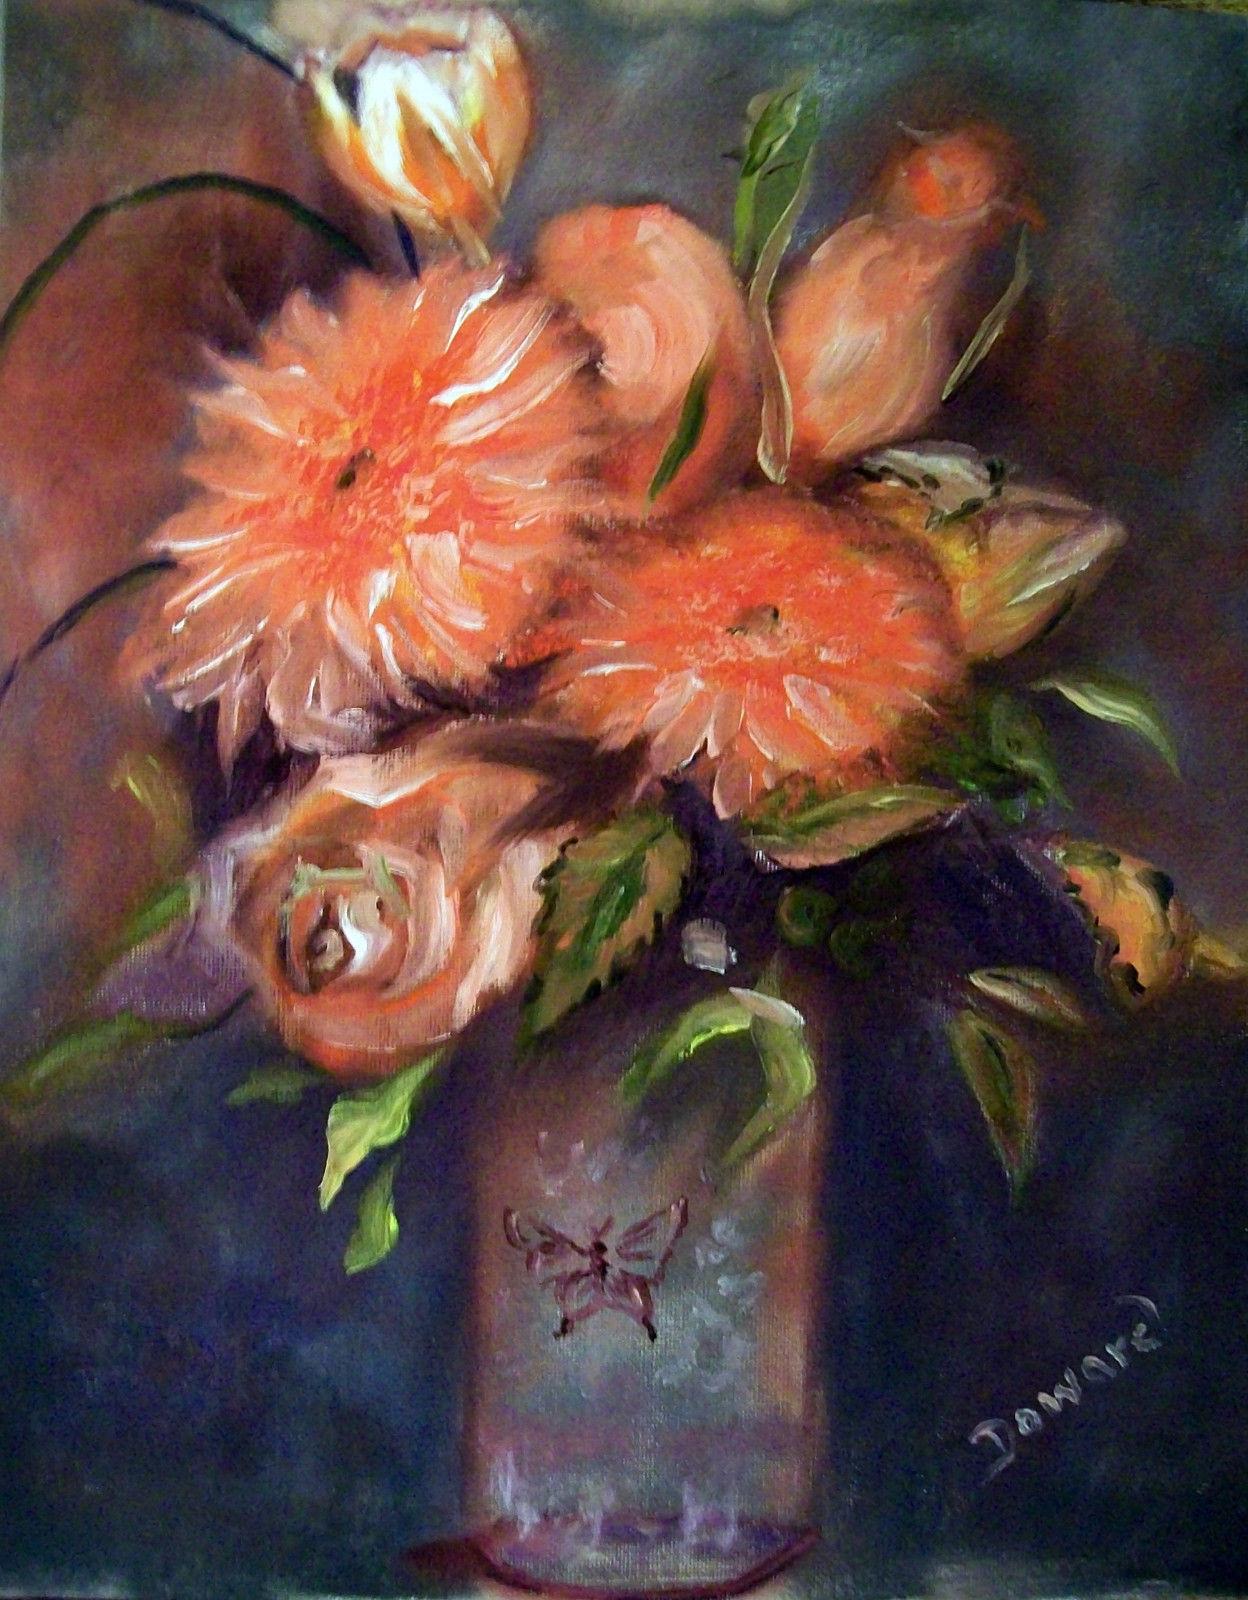 Original 8x10 Floral Canvas Wall Art 018 -: rdoward fine art